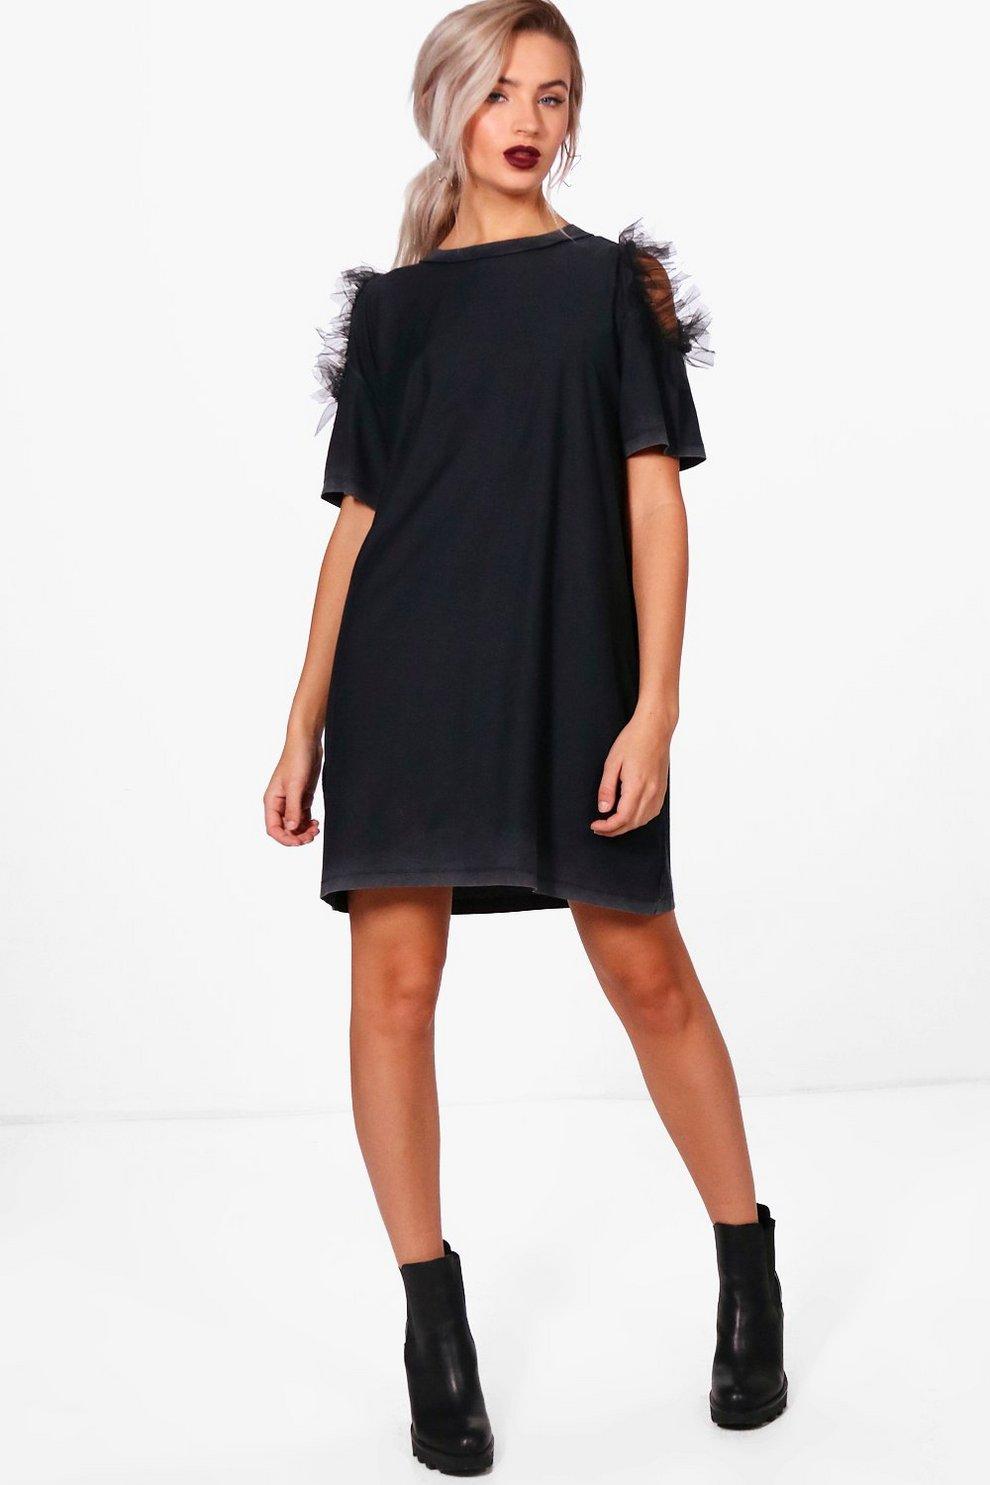 49a5451035b Kath Cold Shoulder Mesh Ruffle T-Shirt Dress | Boohoo